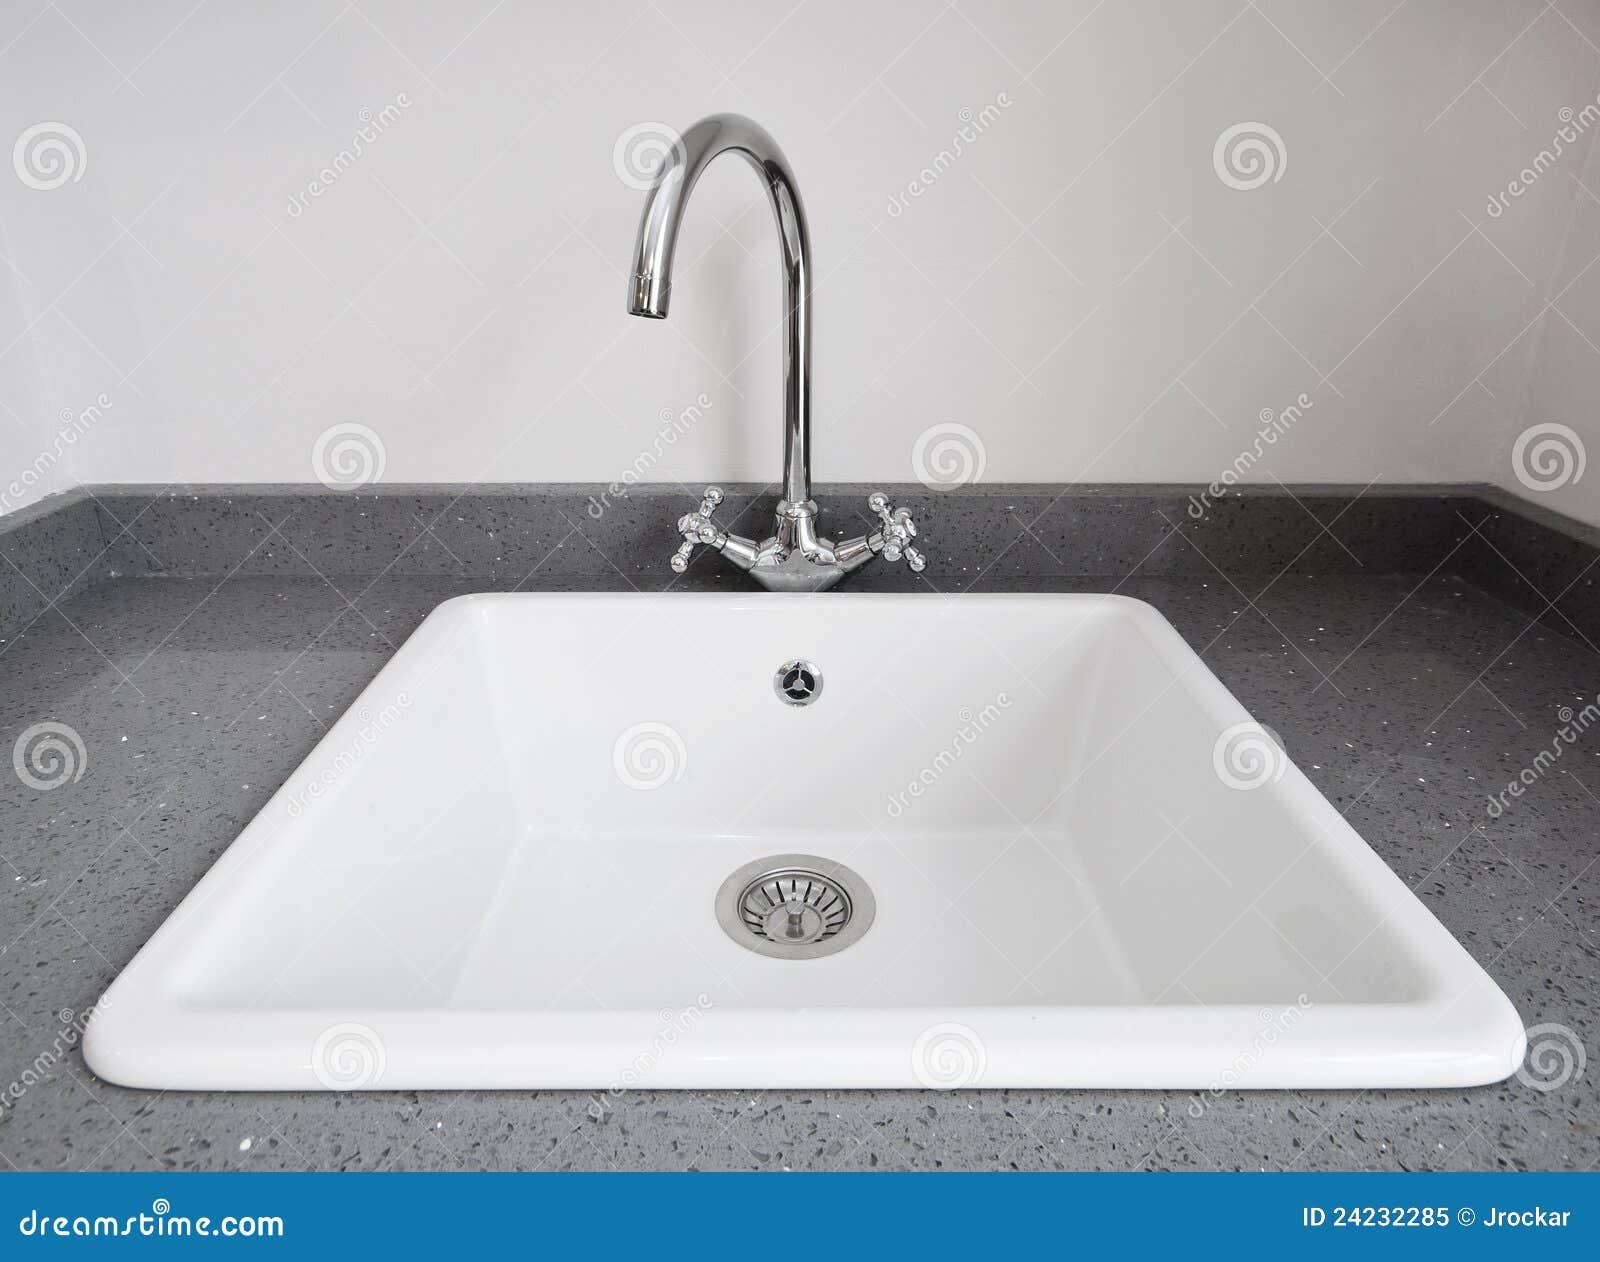 retro kitchen sink royalty free stock photo image 24232285